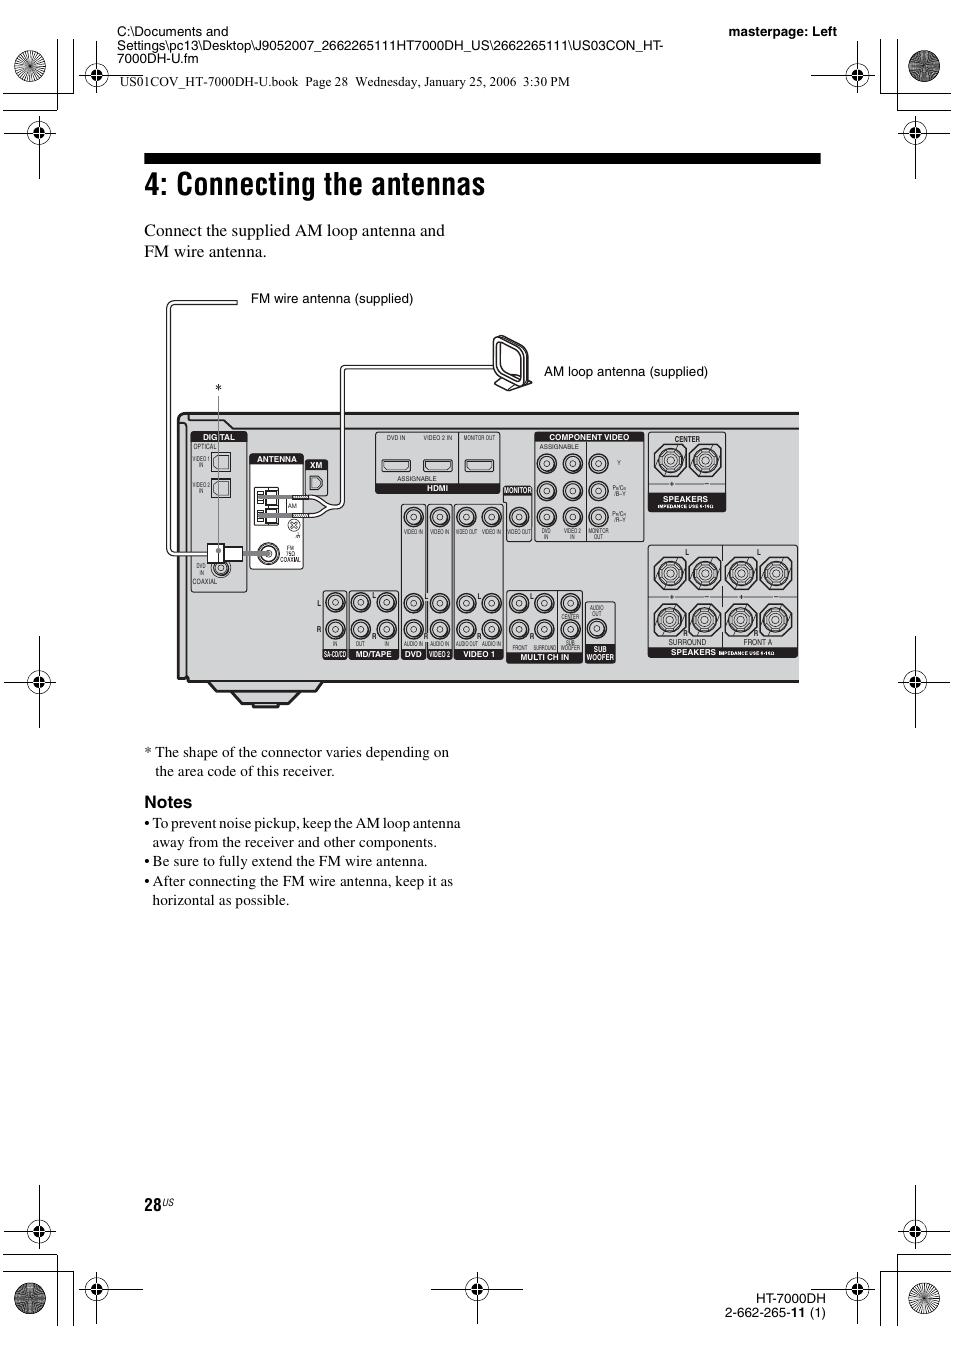 connecting the antennas sony str k7000 user manual page 28 84 rh manualsdir com Sony STR K7000 Specs sony str k7000 manual pdf